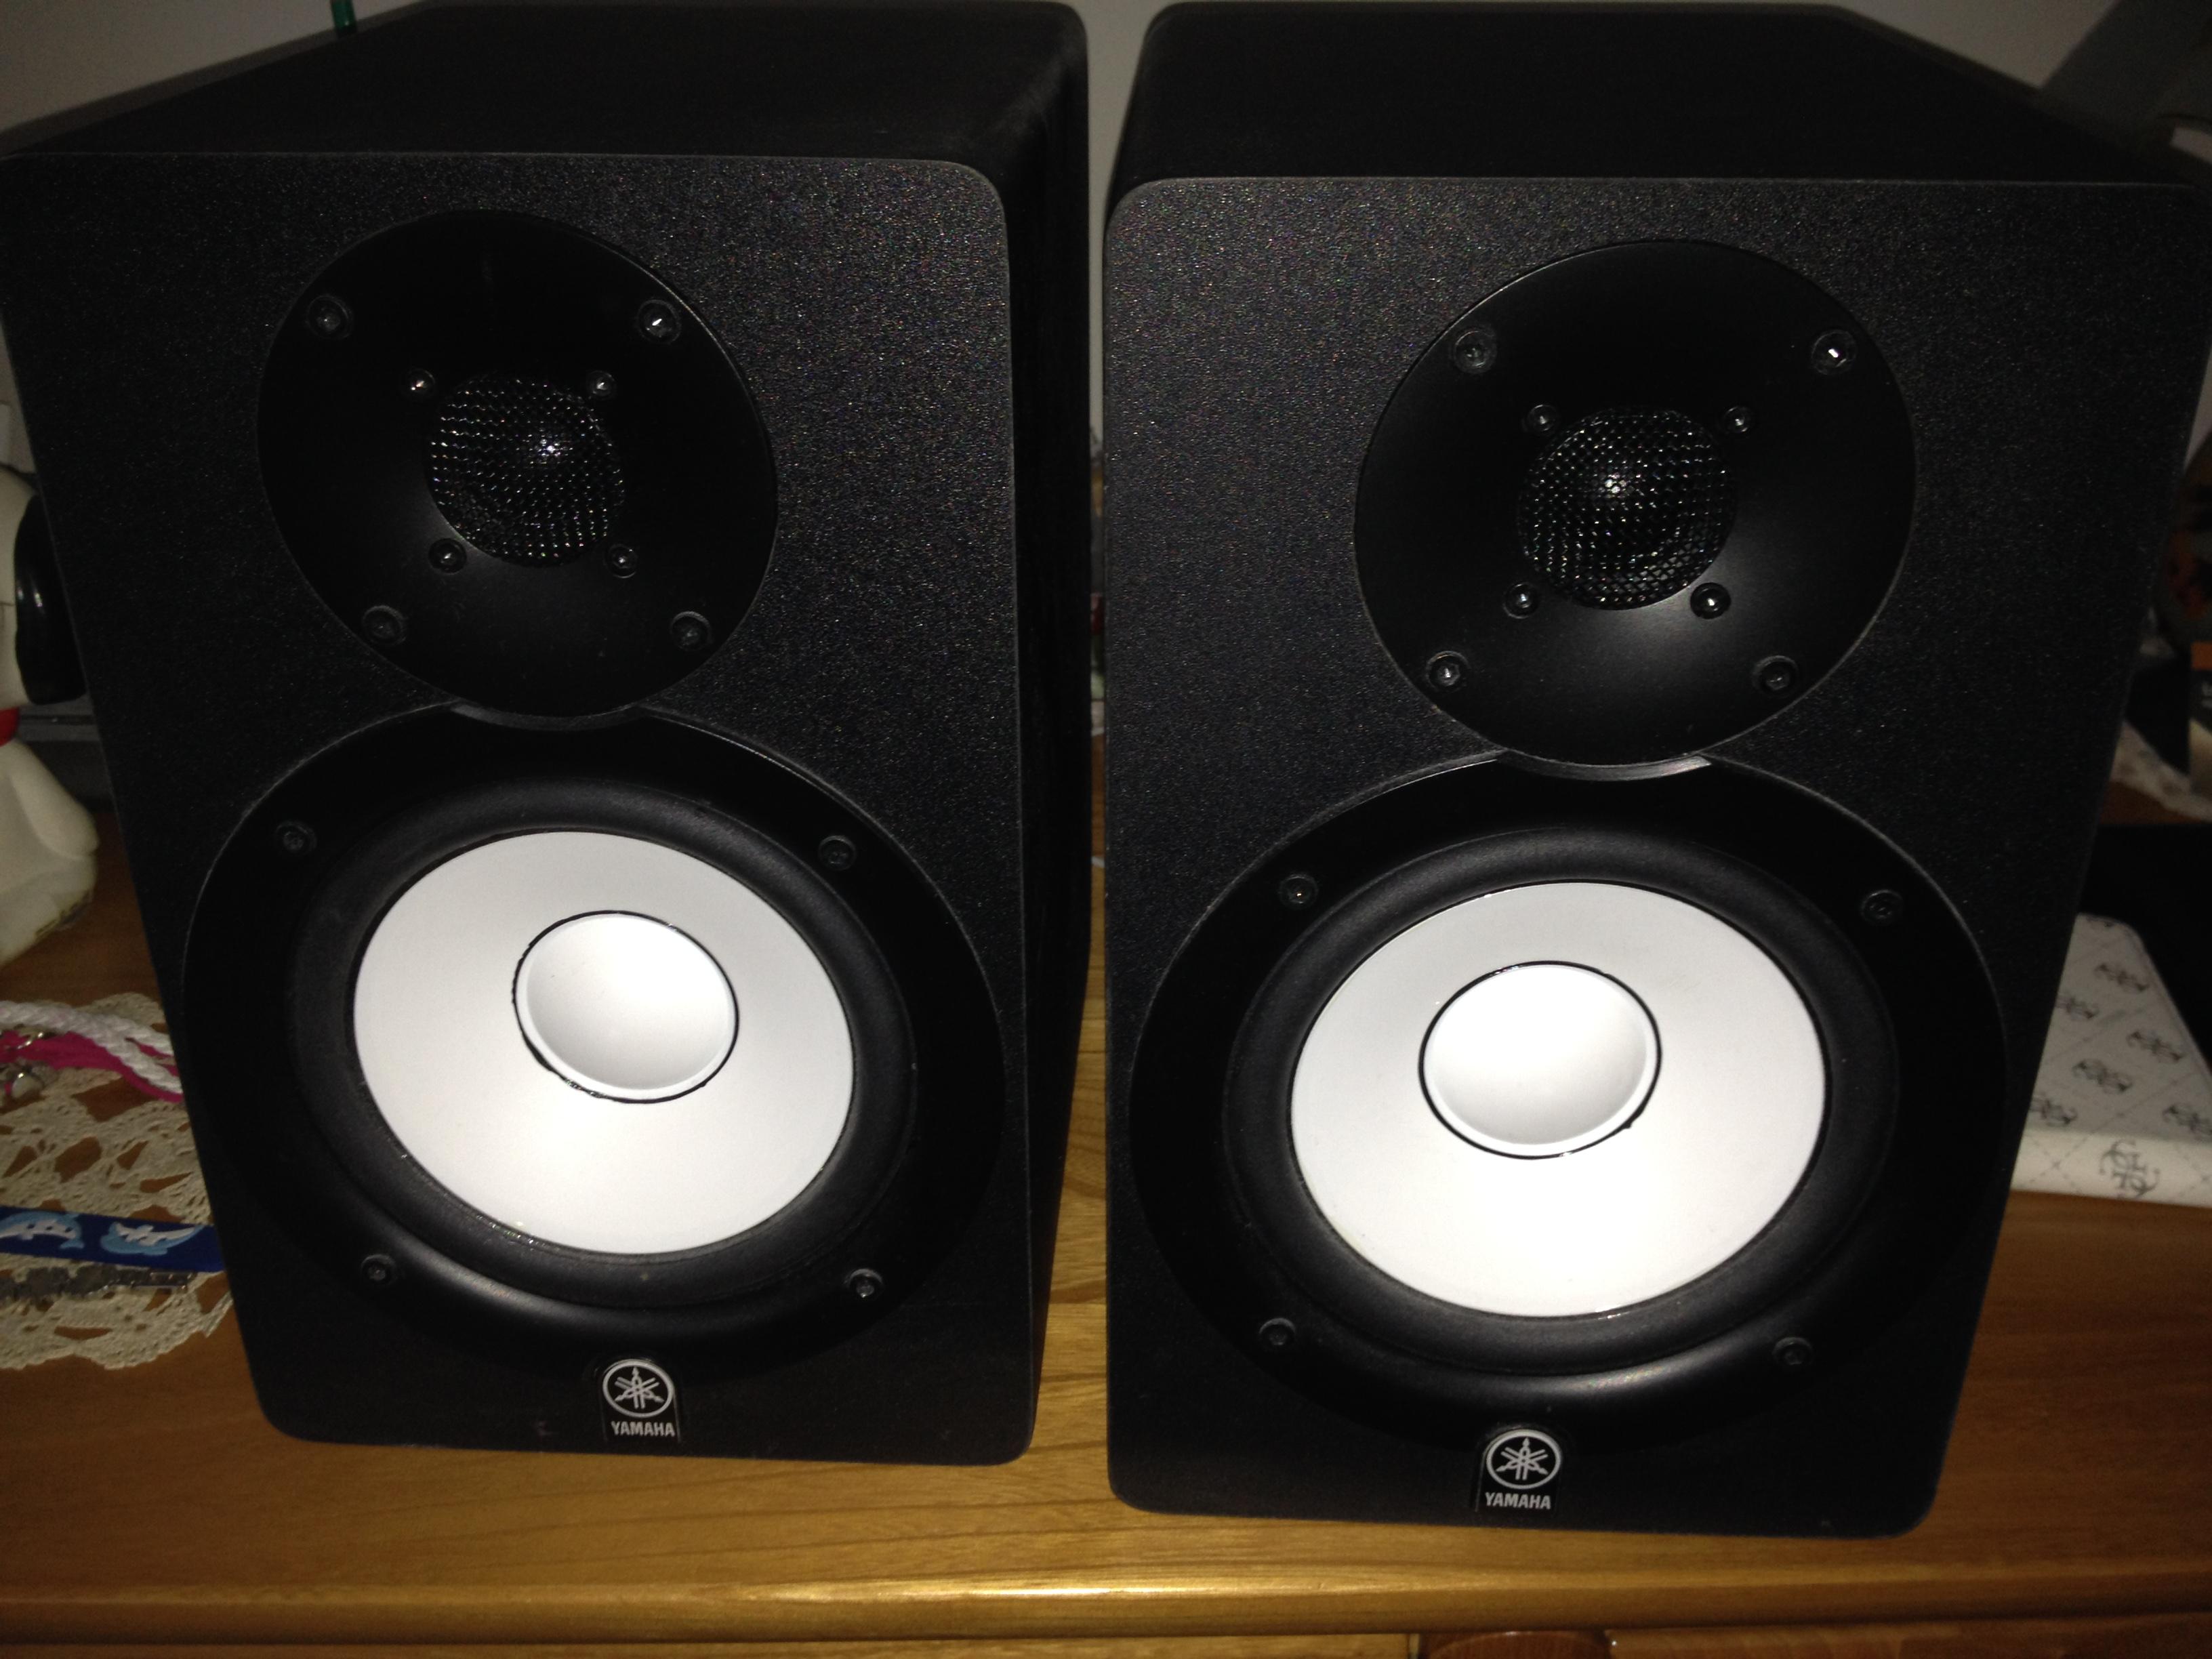 Hs50m yamaha hs50m audiofanzine for Yamaha hs50m review